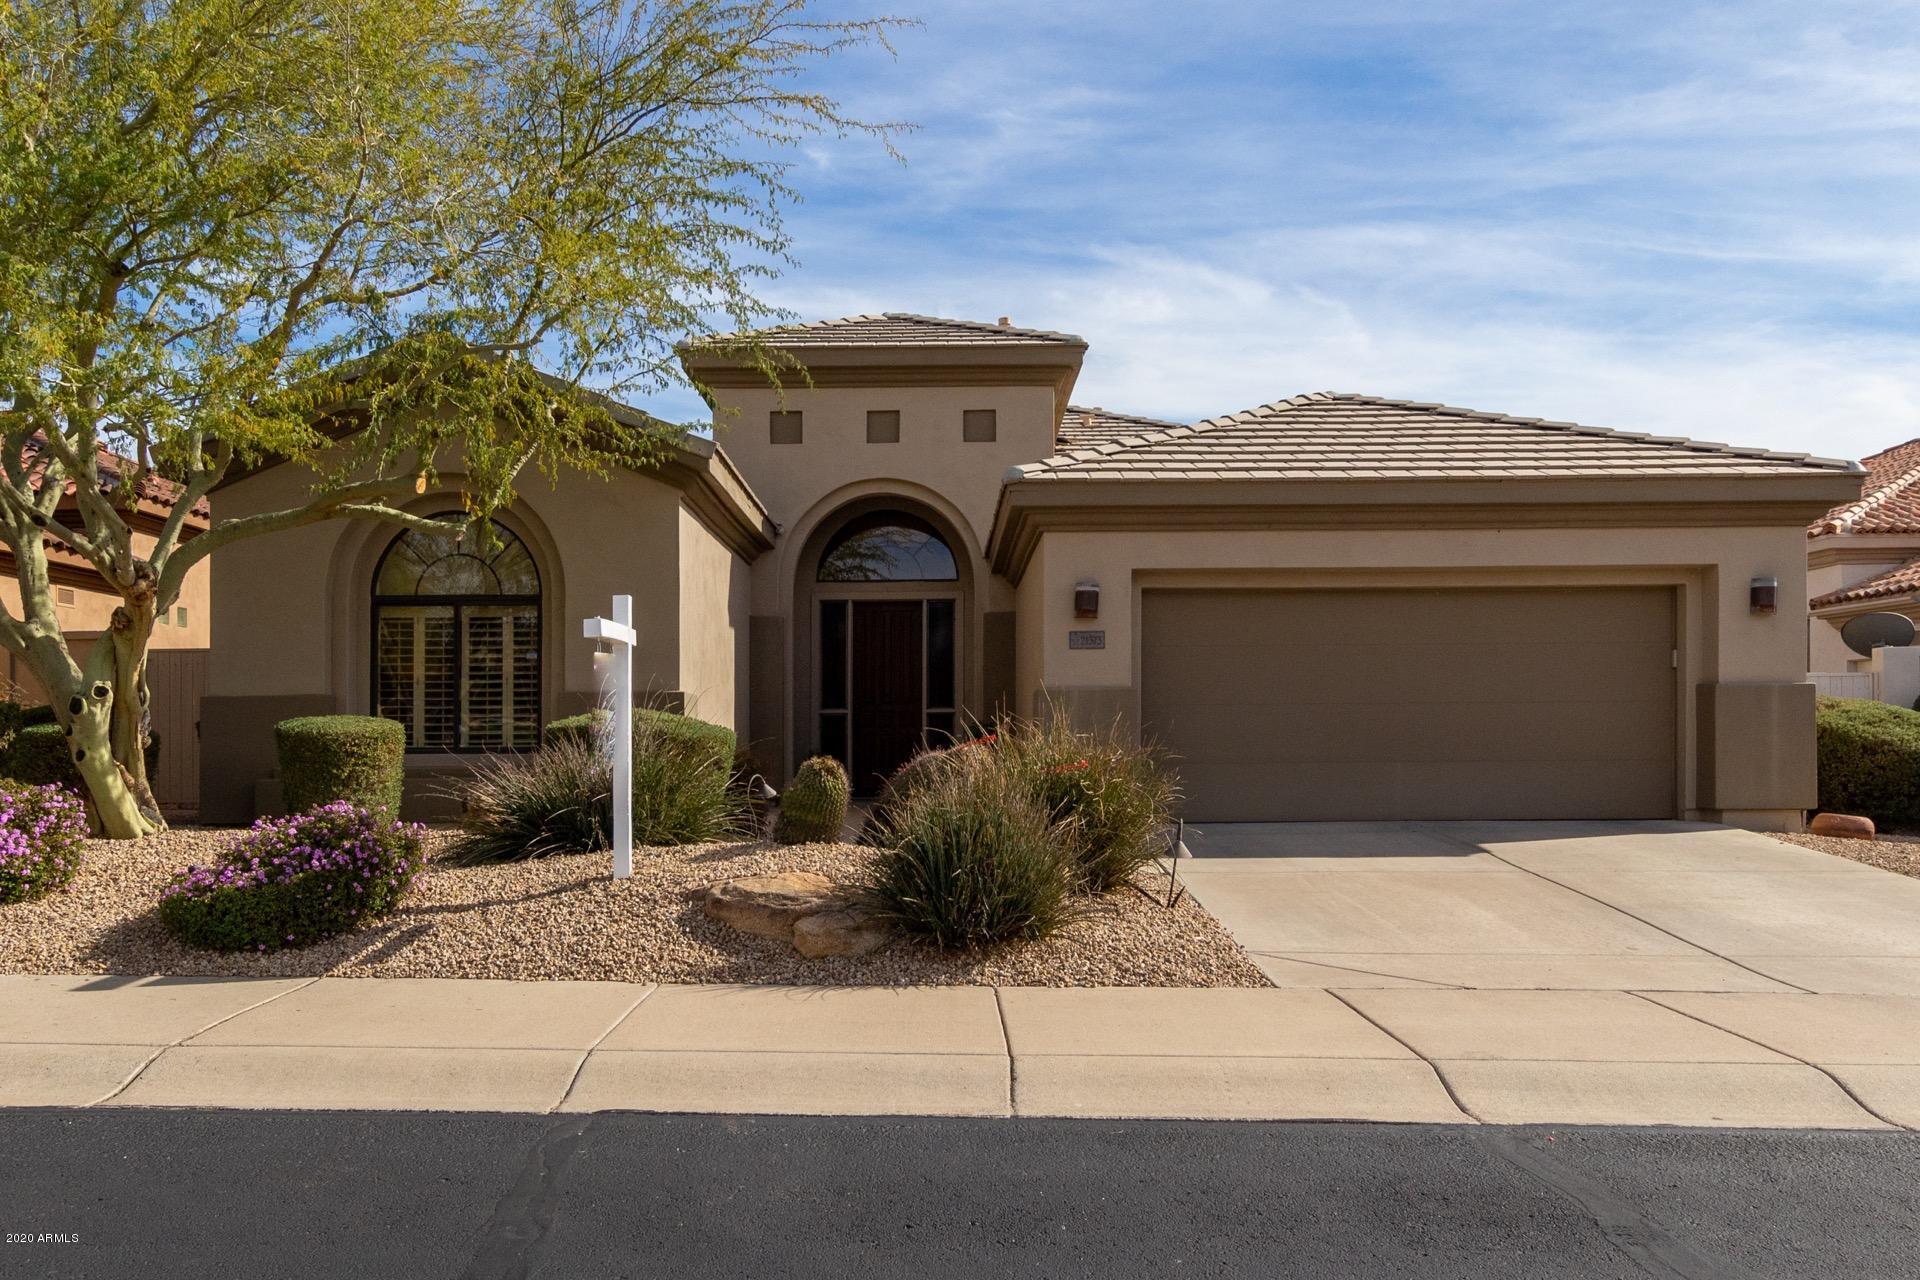 Photo of 21373 N 77TH Place, Scottsdale, AZ 85255